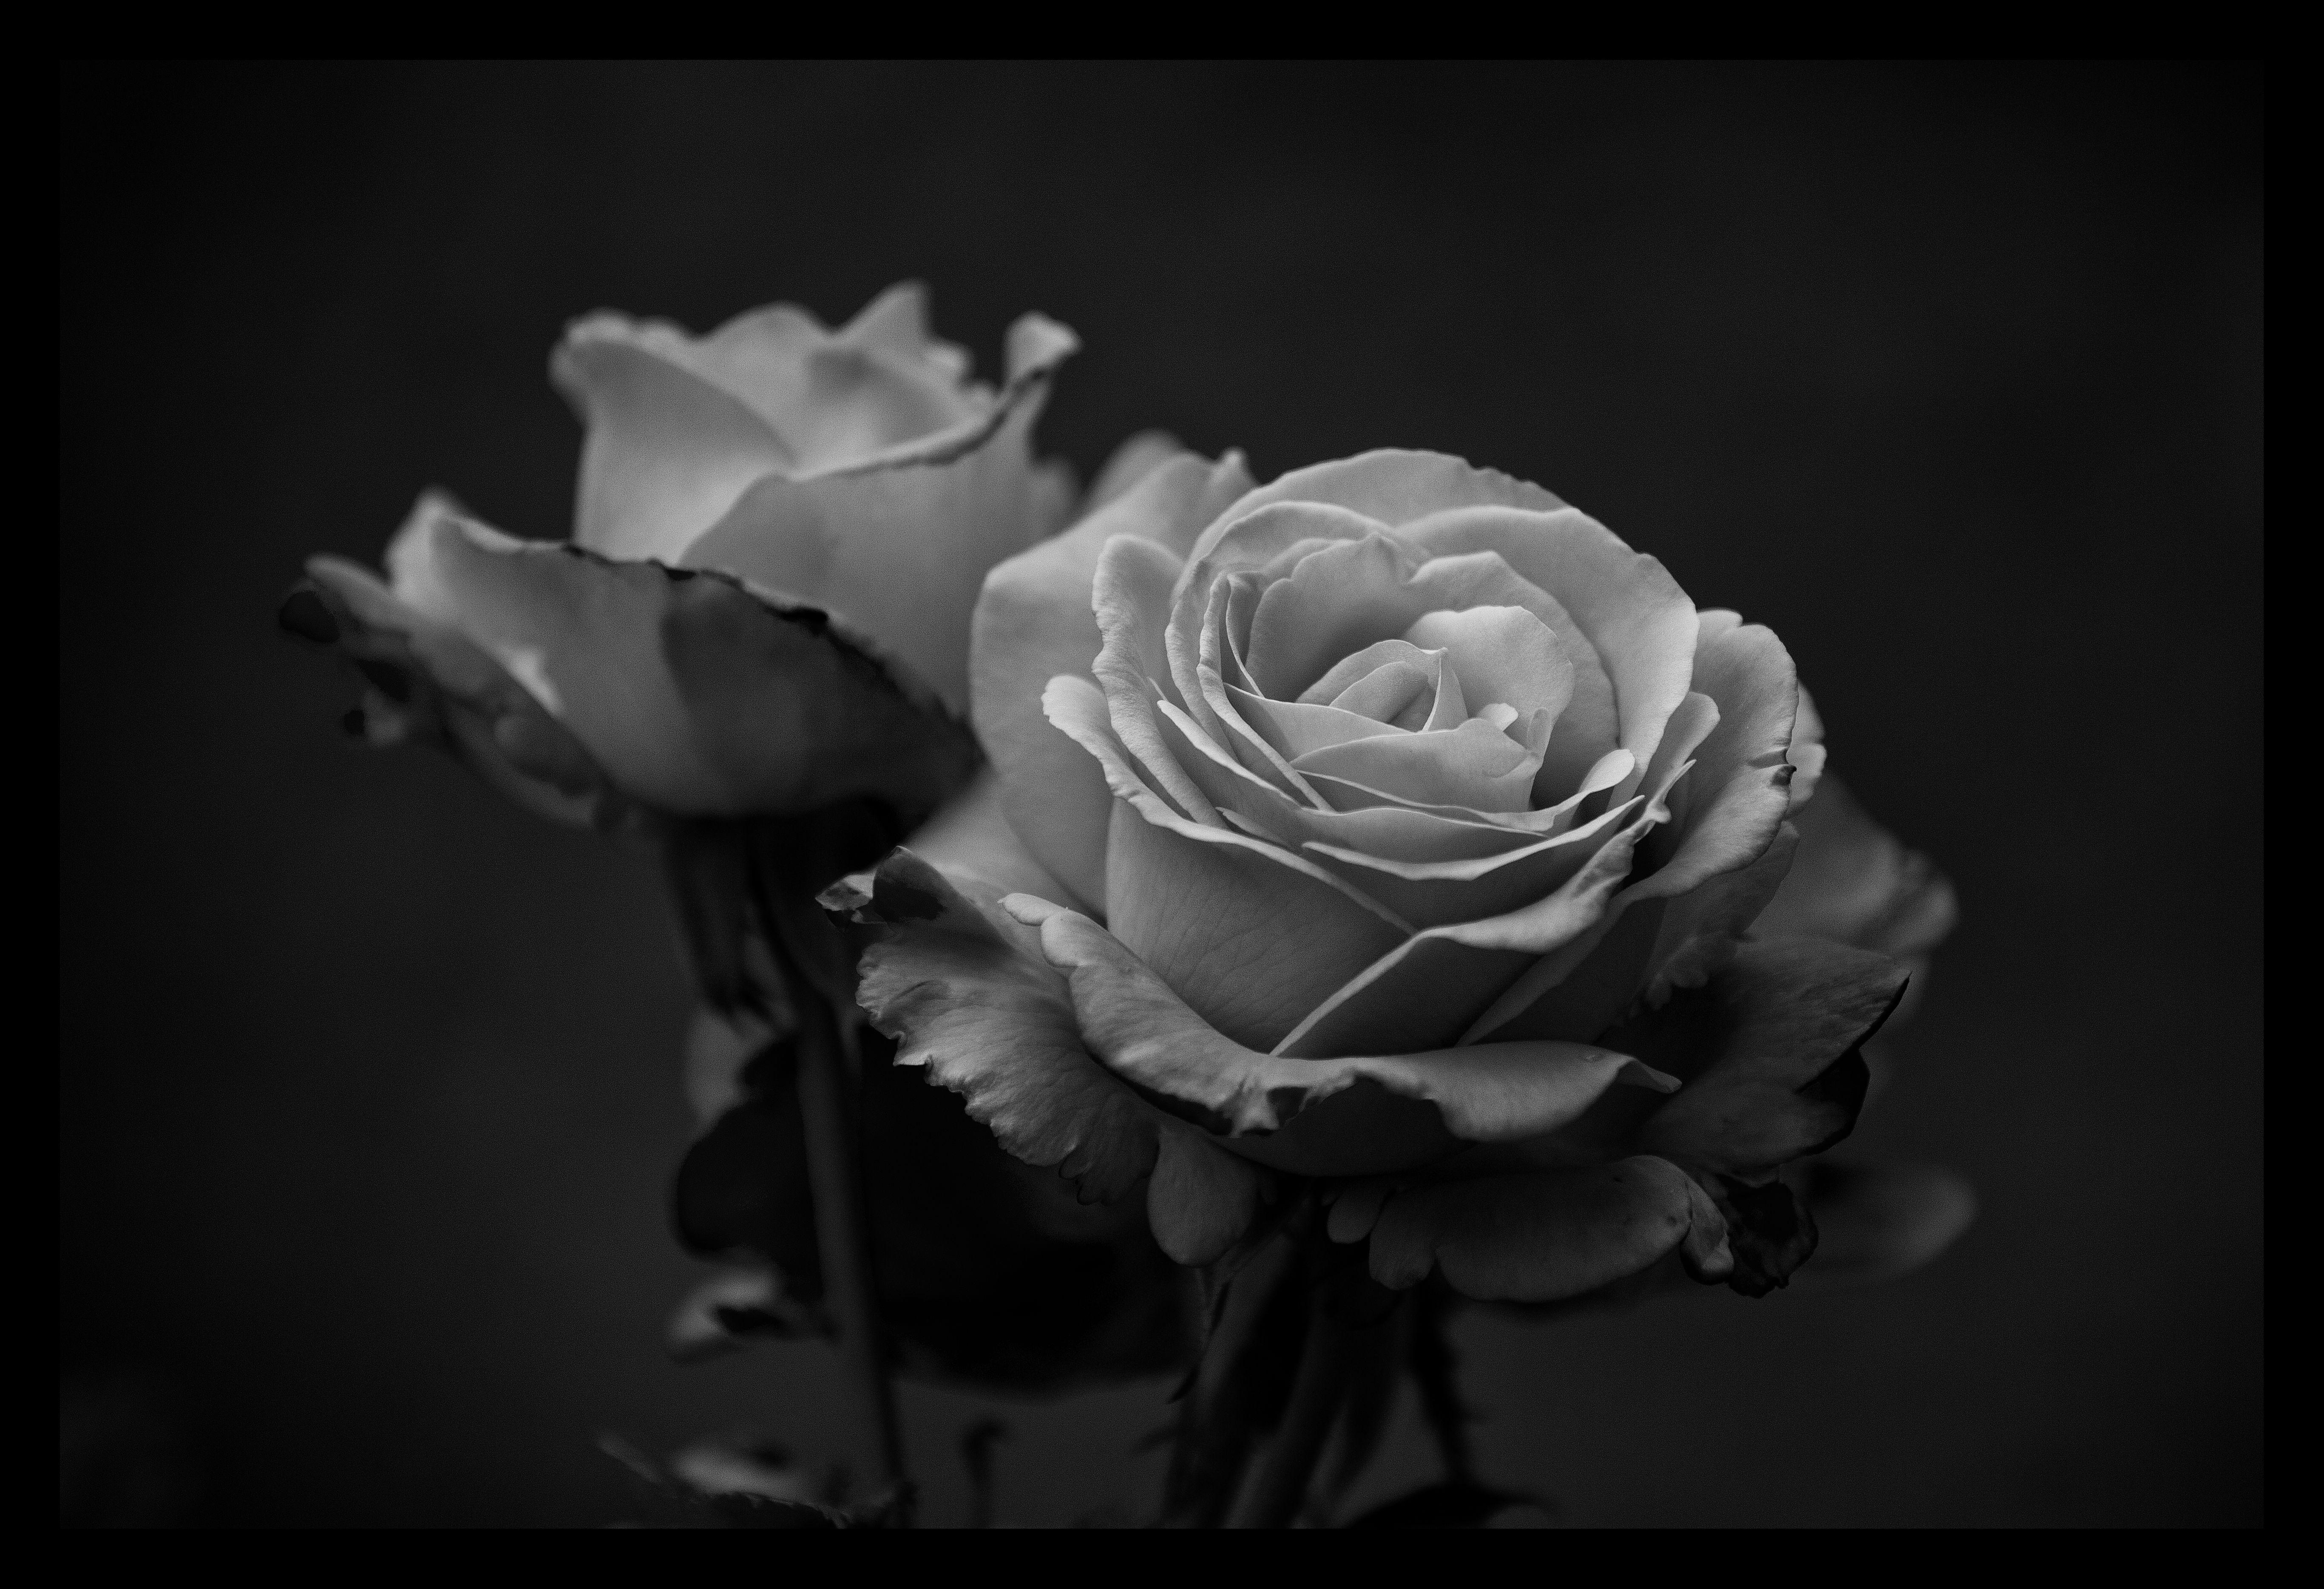 Black'n'white roses by Sloorth on DeviantArt Black and